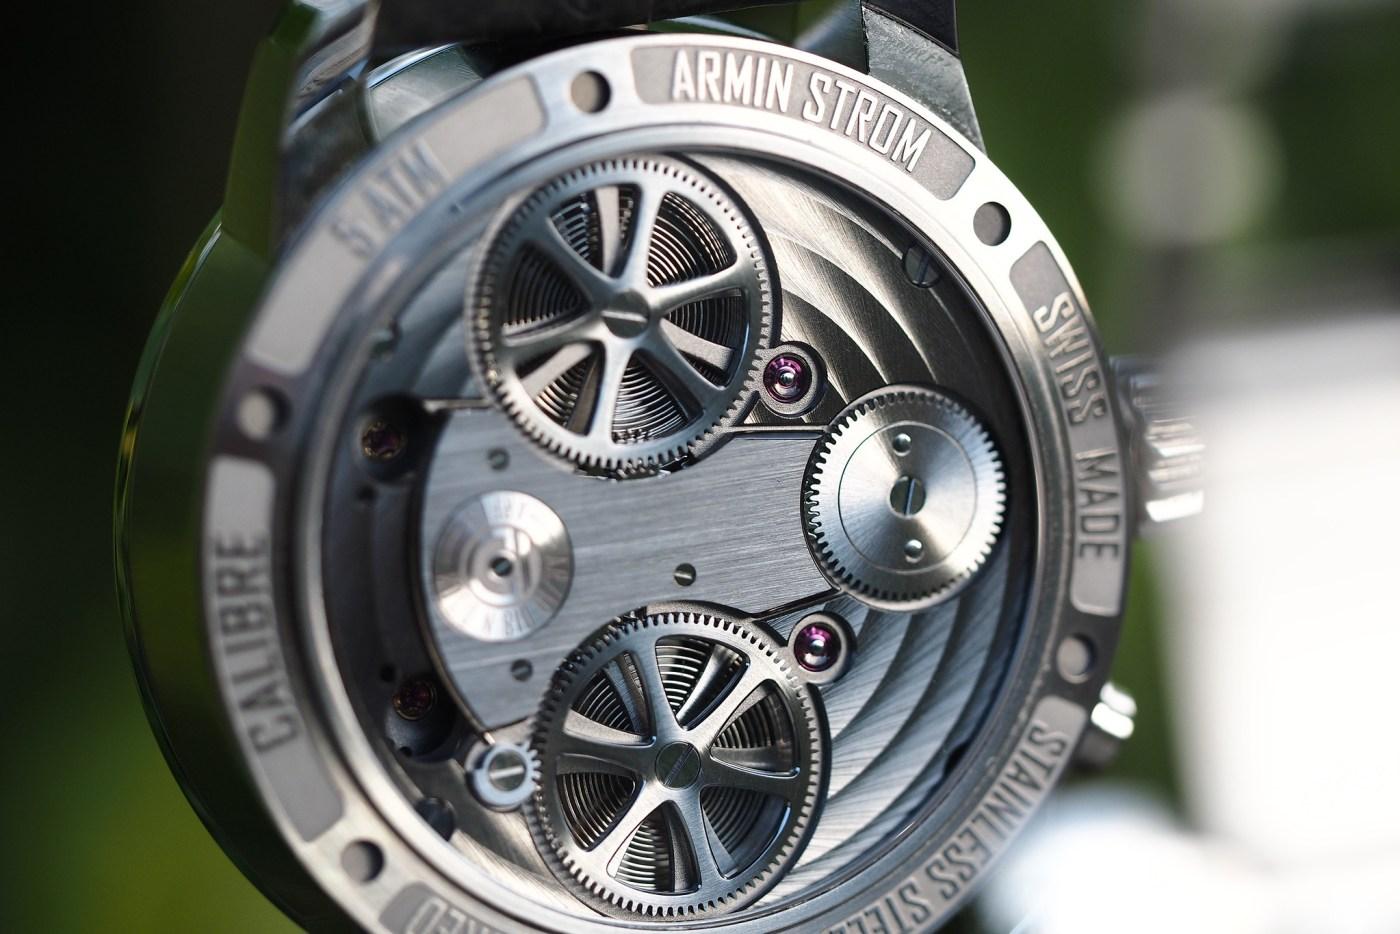 Armin Strom Mirrored Force Resonance stainless steel